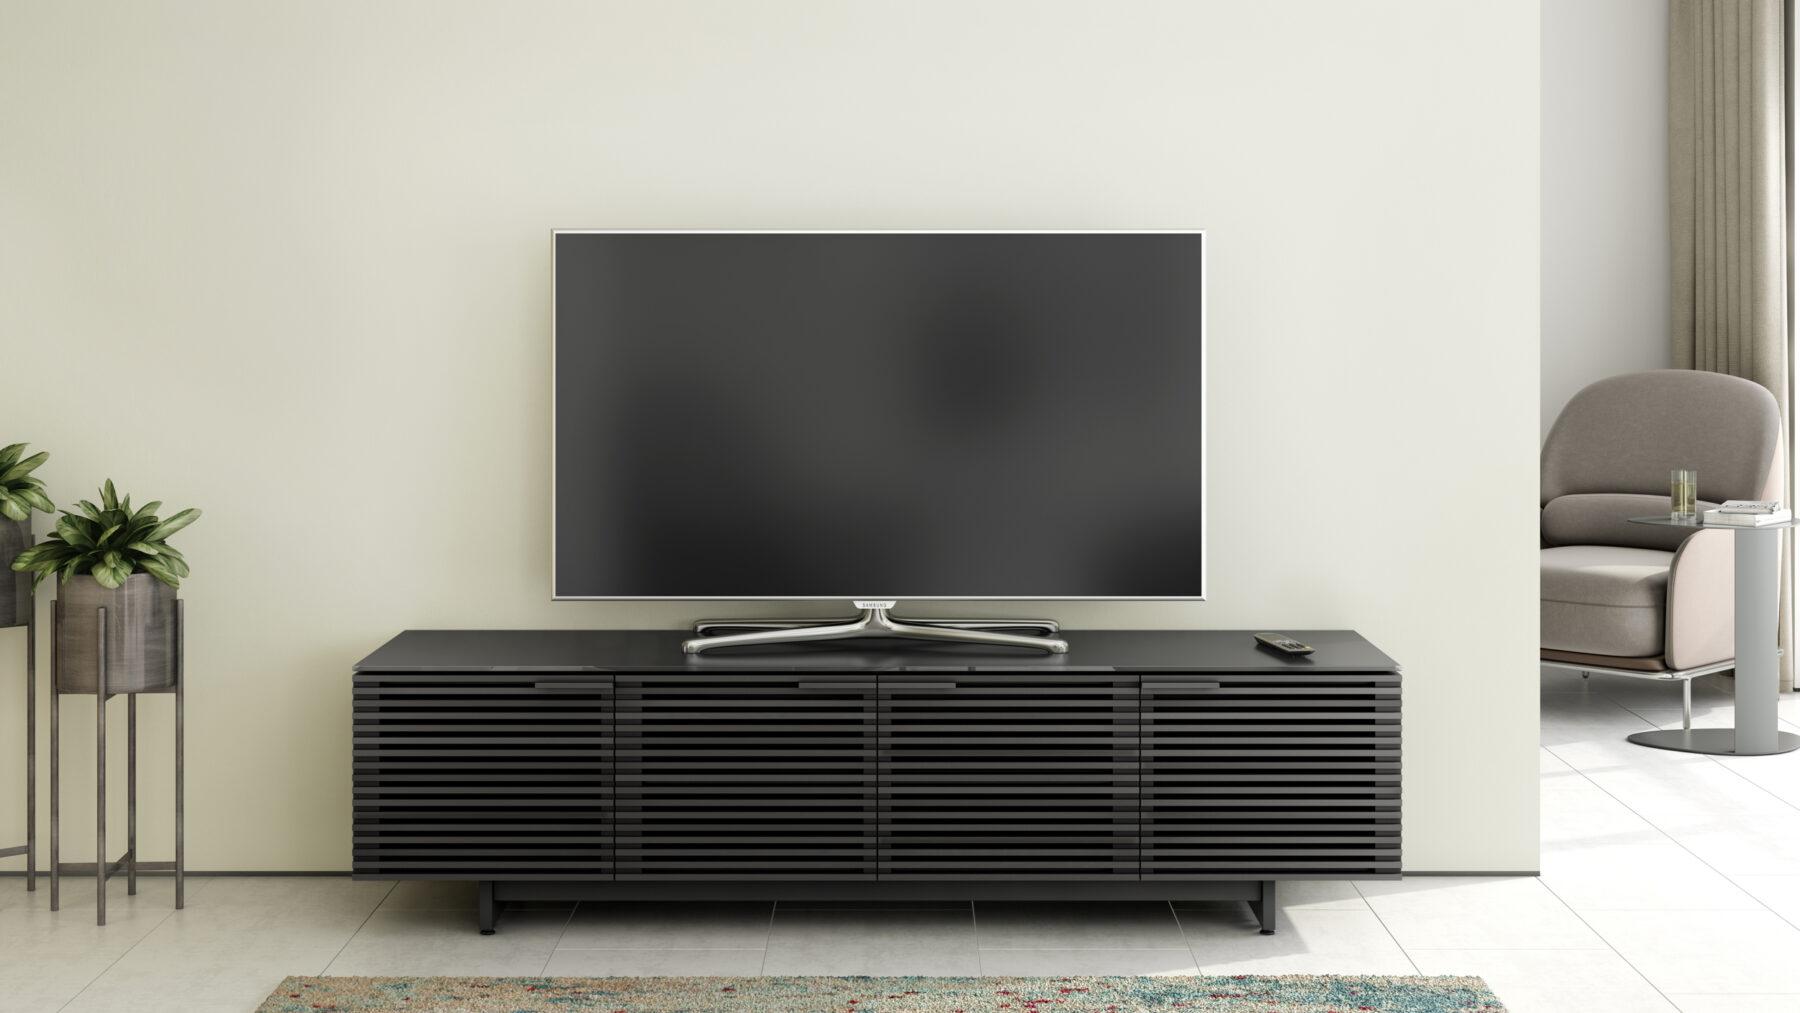 corridor-8173-modern-TV-cabinet-charcoal-BDI-1